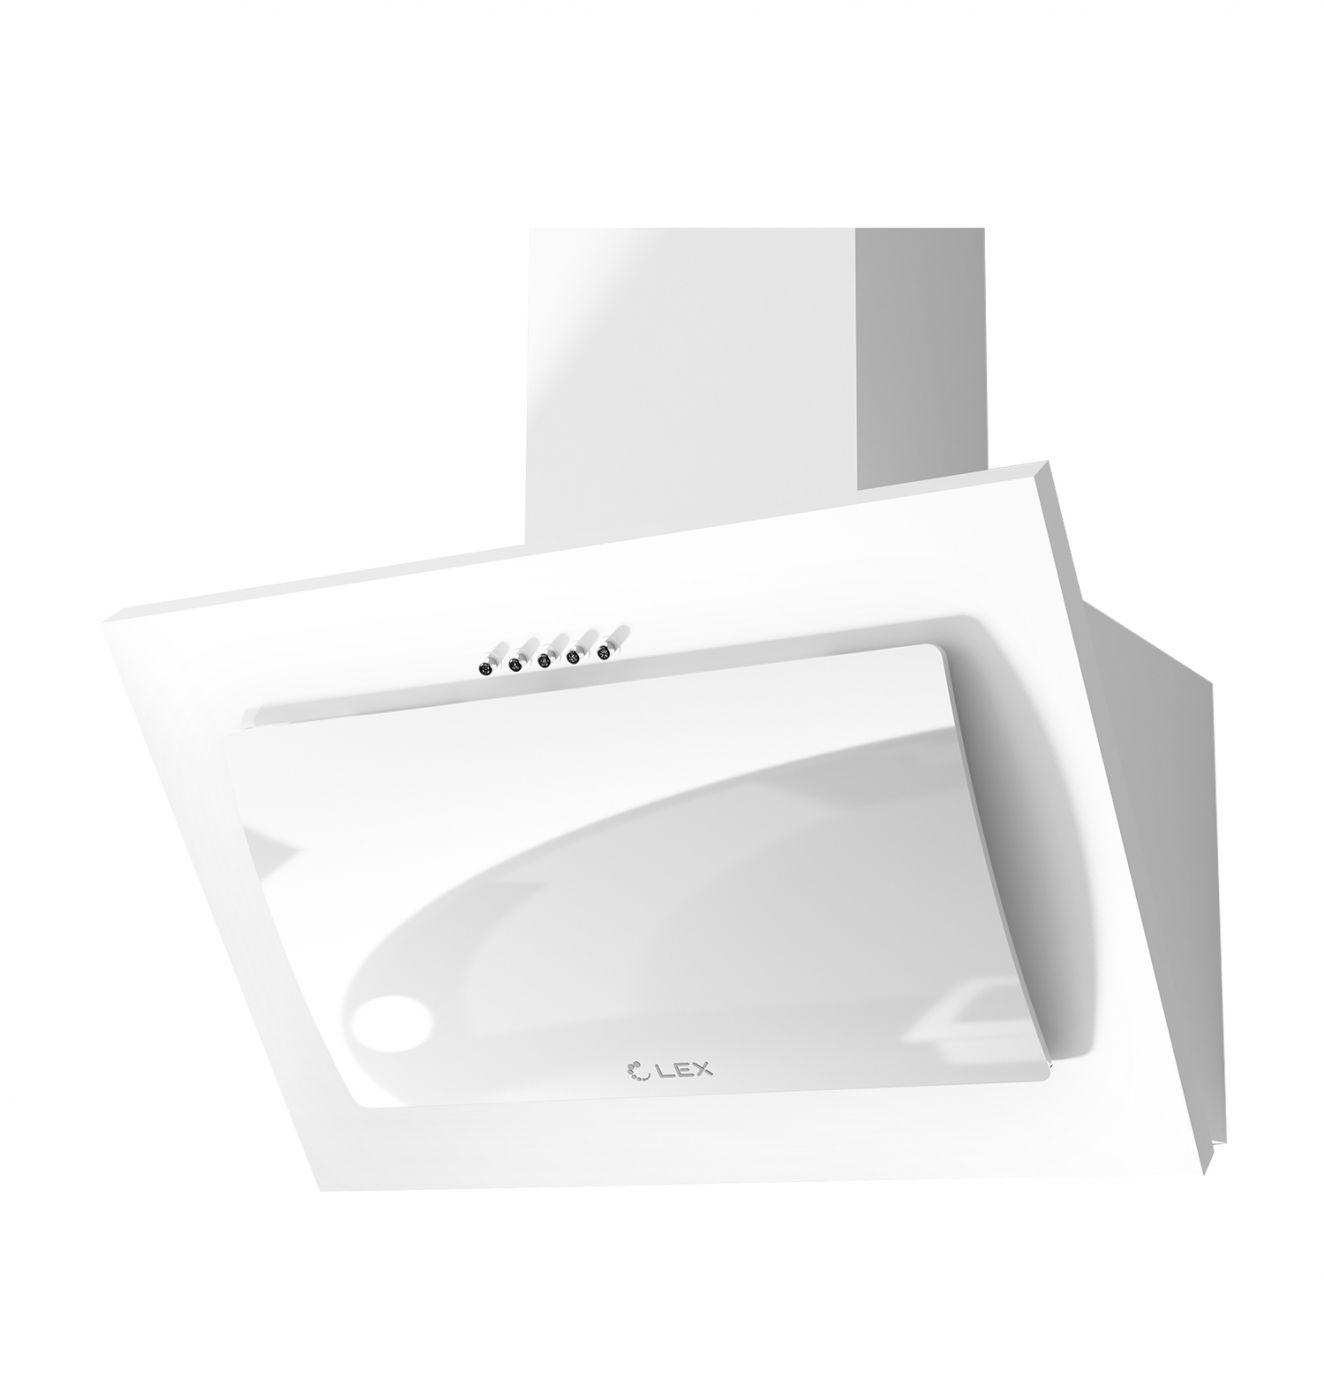 Вытяжка LEX Mika C 600 WH (CHTI000341)